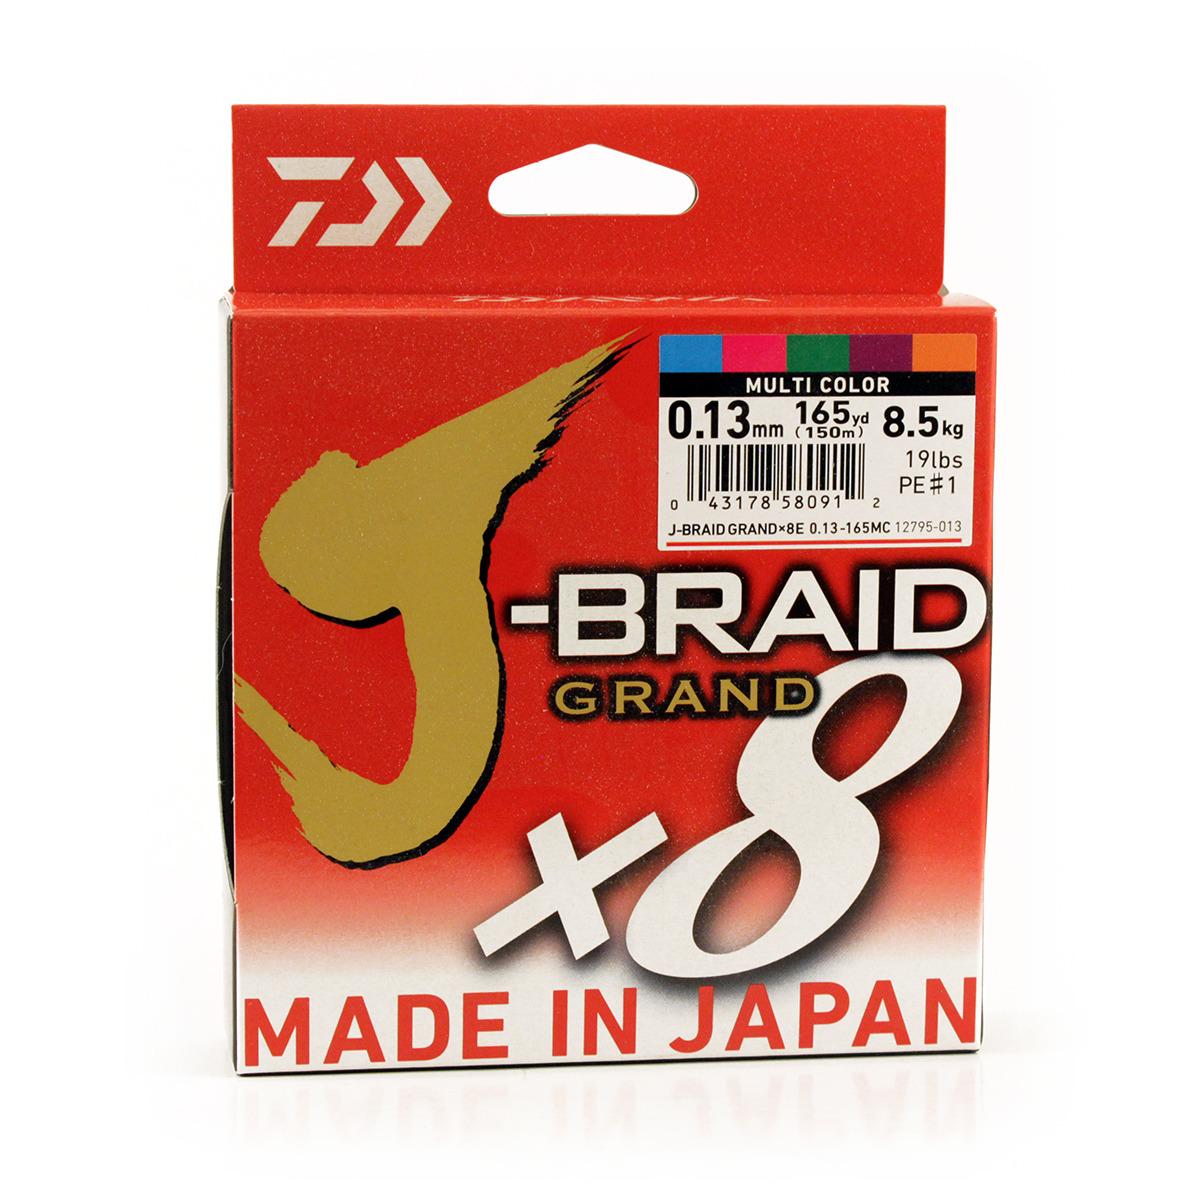 Плетеный шнур Daiwa J-Braid Grand X8, 69585, мультиколор, 150 м, 0,13 мм layered braid rope choker necklace